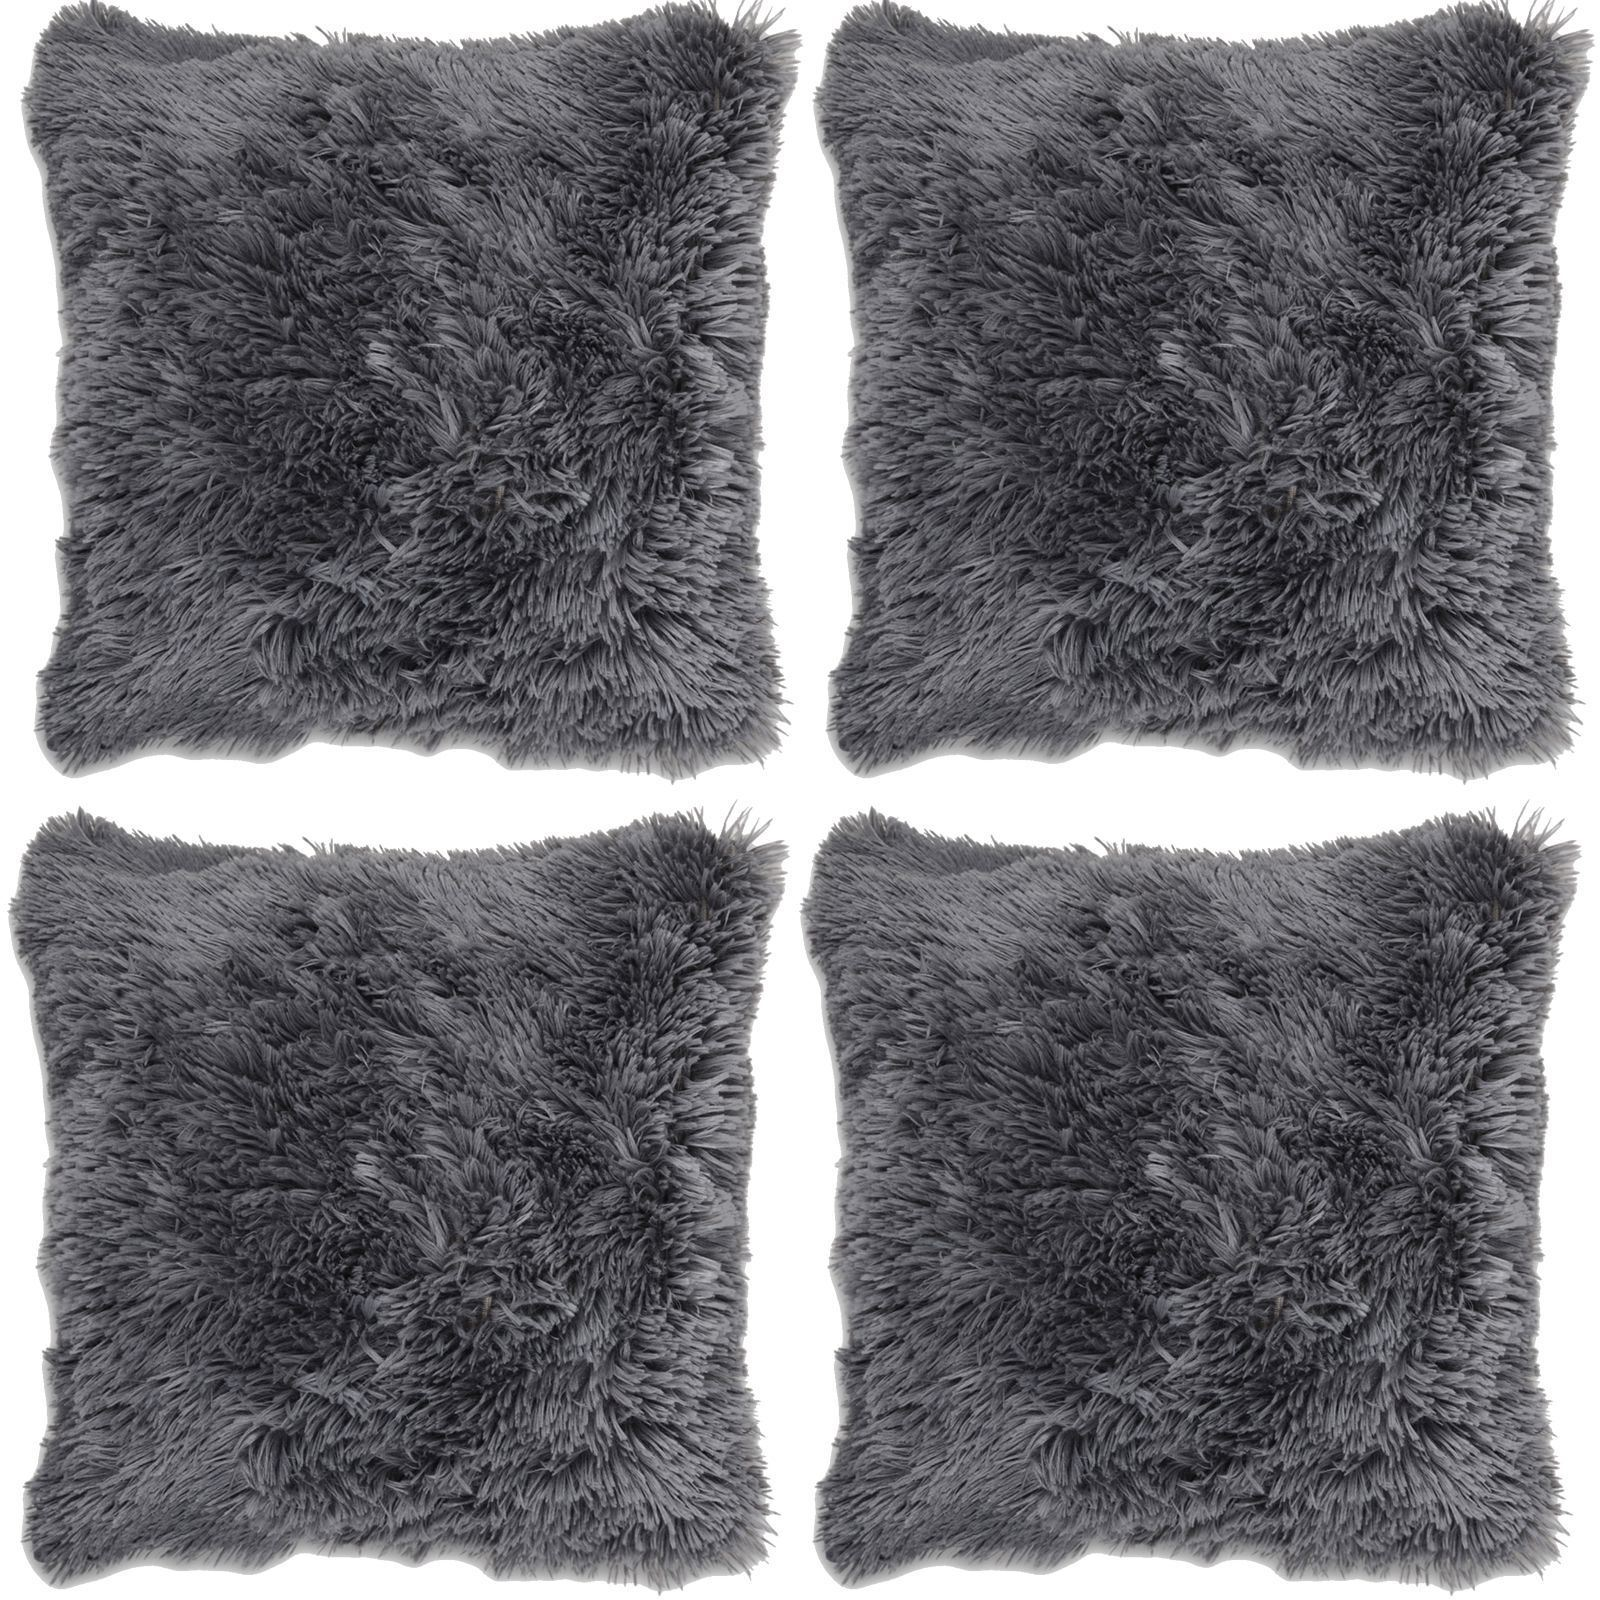 x 4 shaggy super soft faux fur cushion covers cuddly. Black Bedroom Furniture Sets. Home Design Ideas